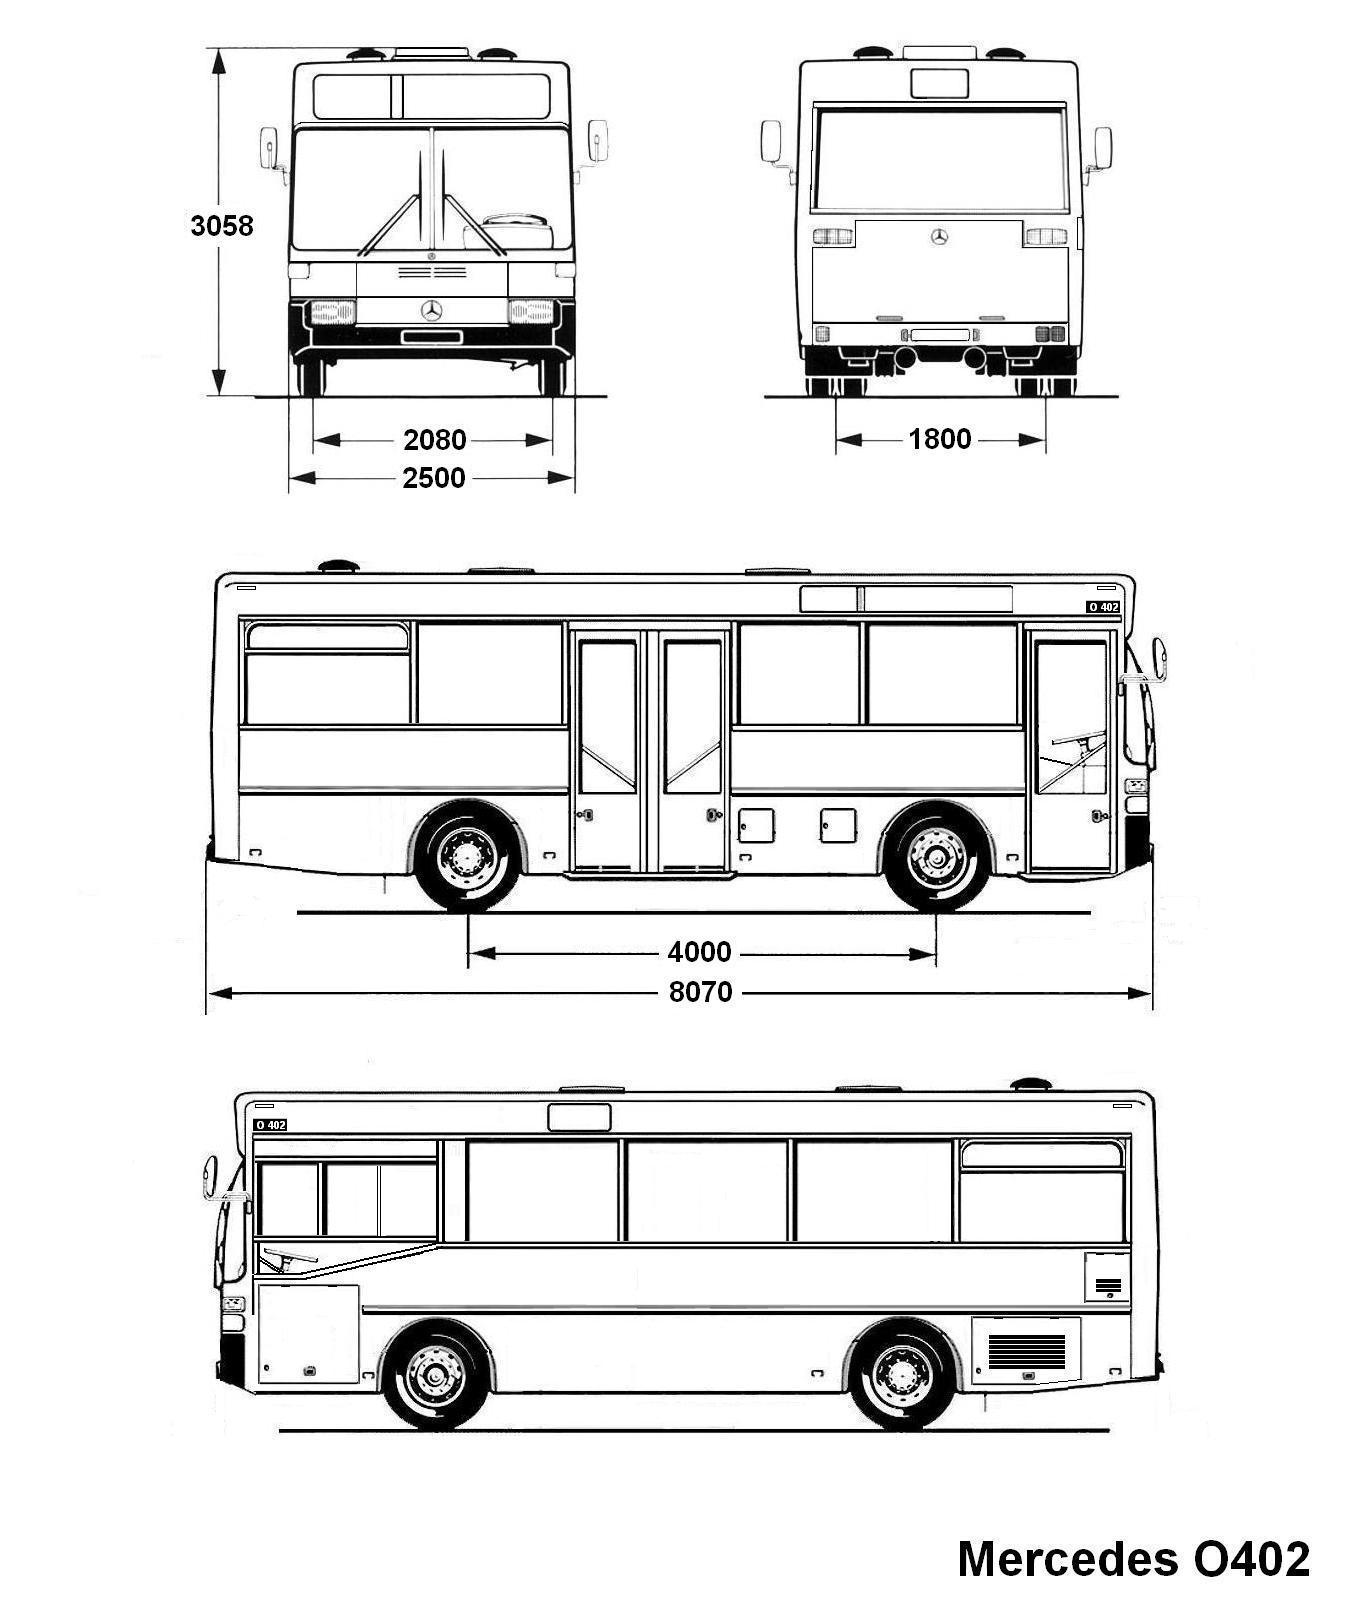 Mercedes-Benz O402 blueprint